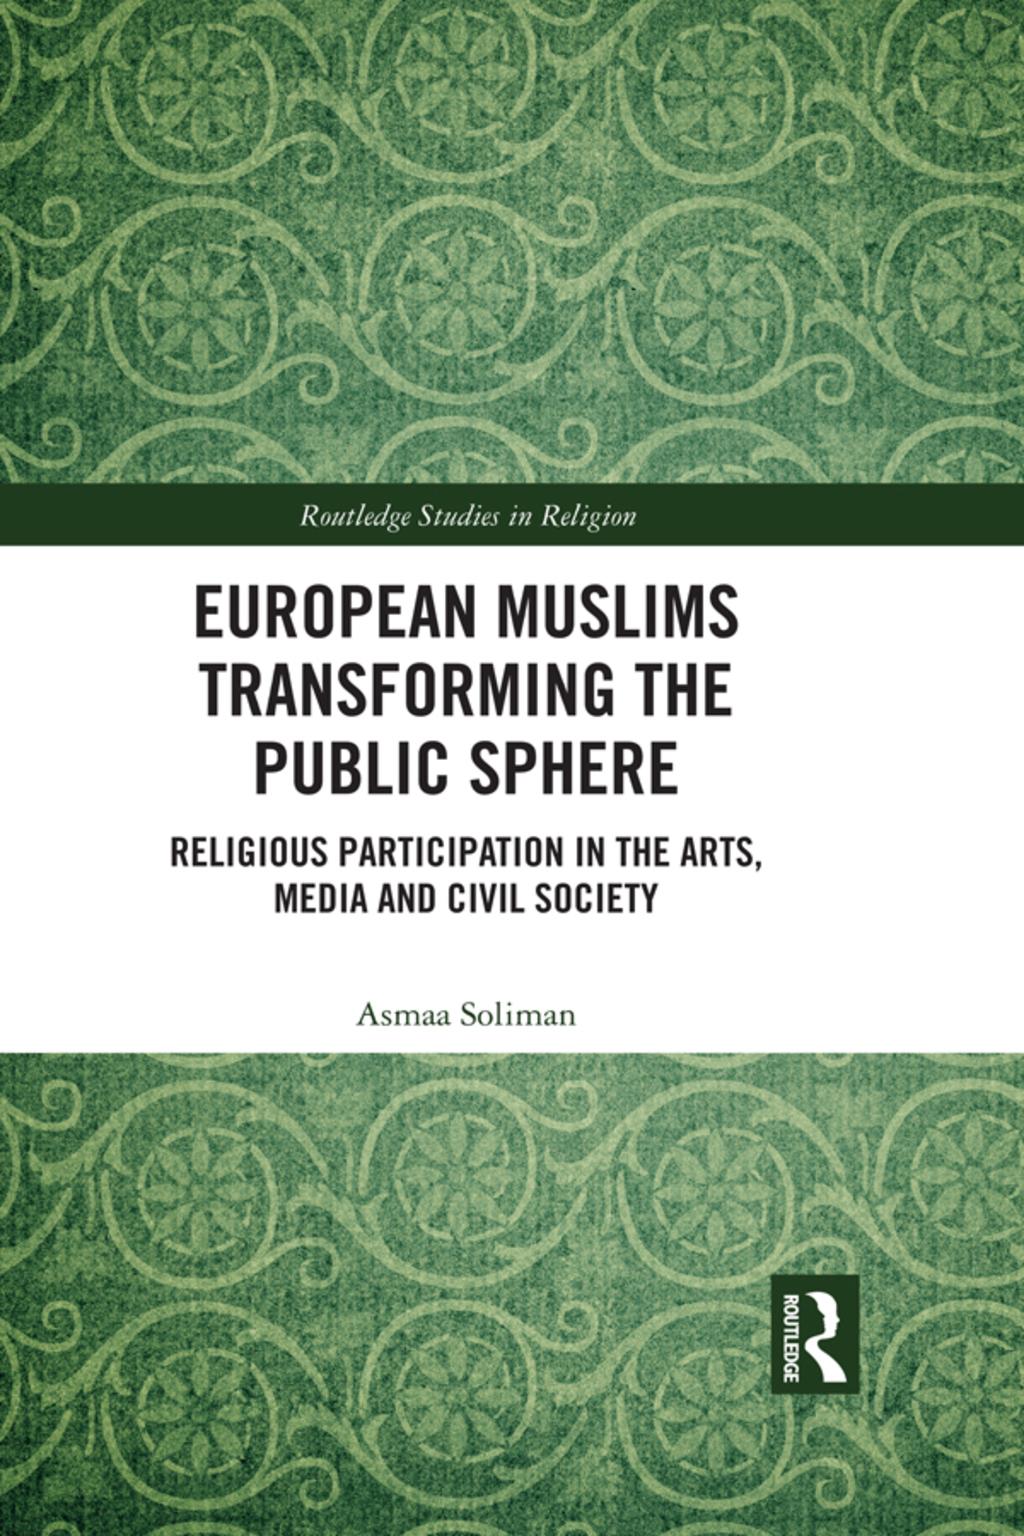 European Muslims Transforming the Public Sphere (eBook Rental)